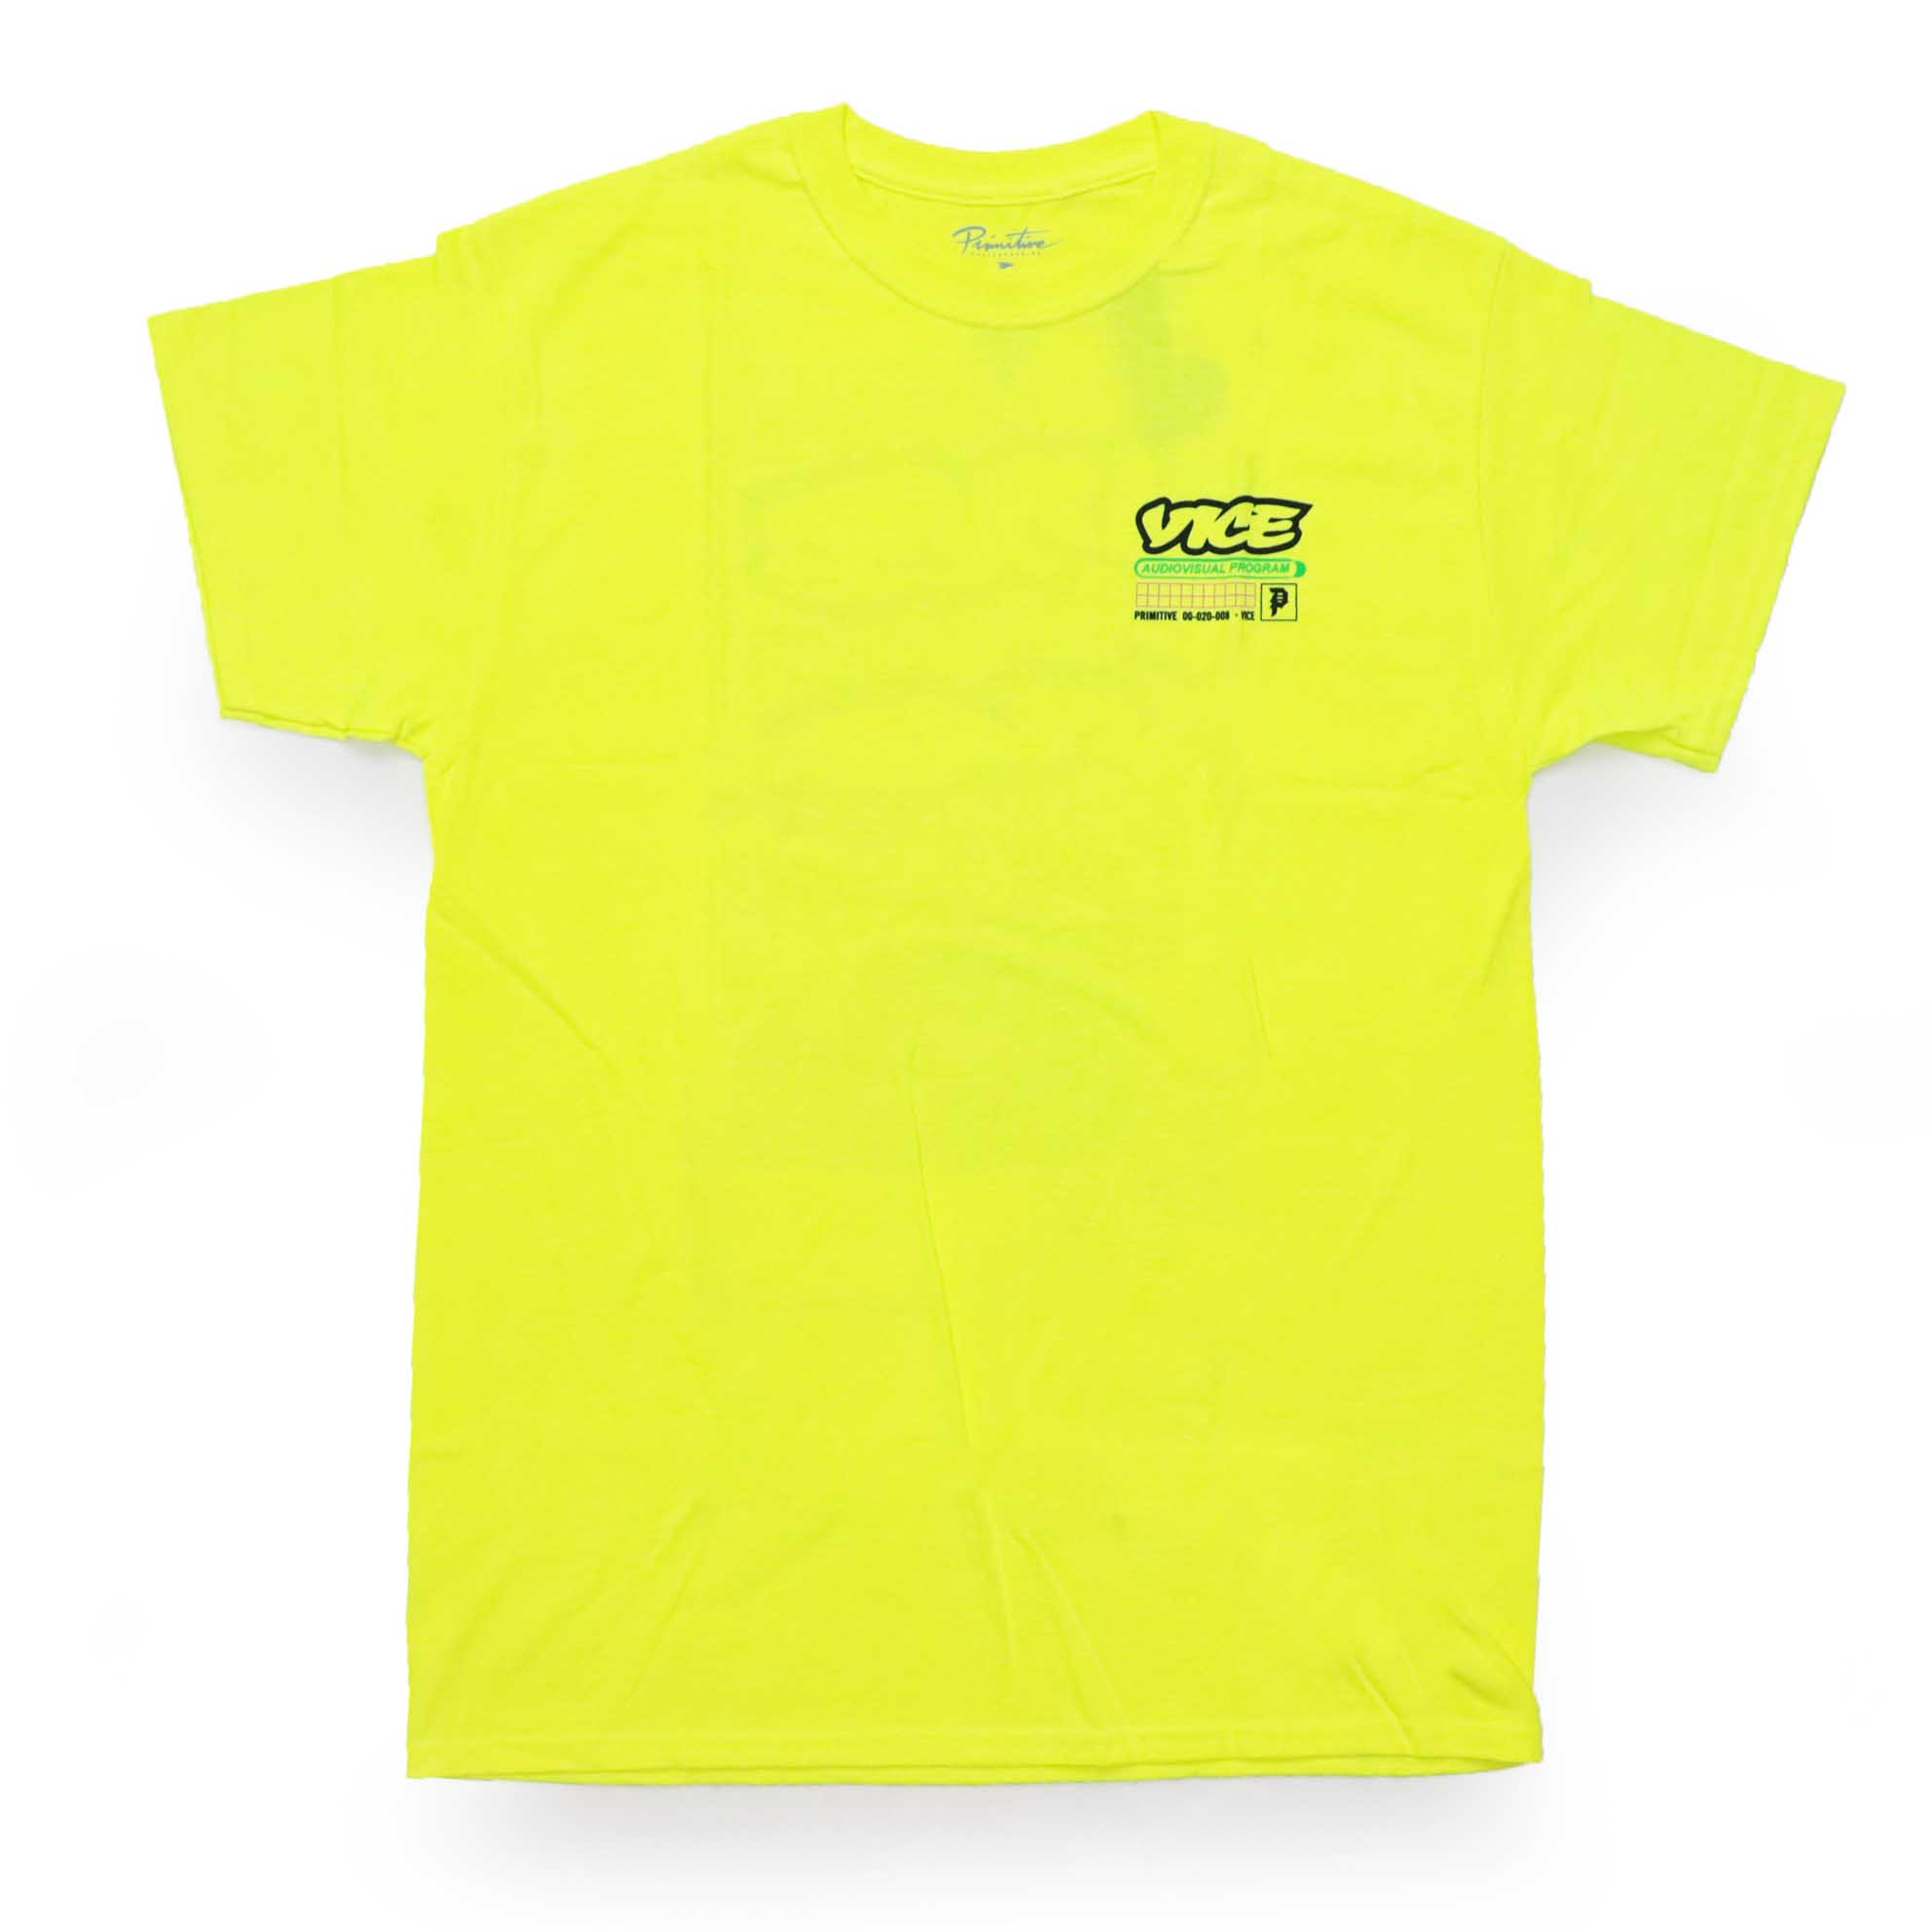 Camiseta Primitive x Vice Program - Verde Neon (Importado)